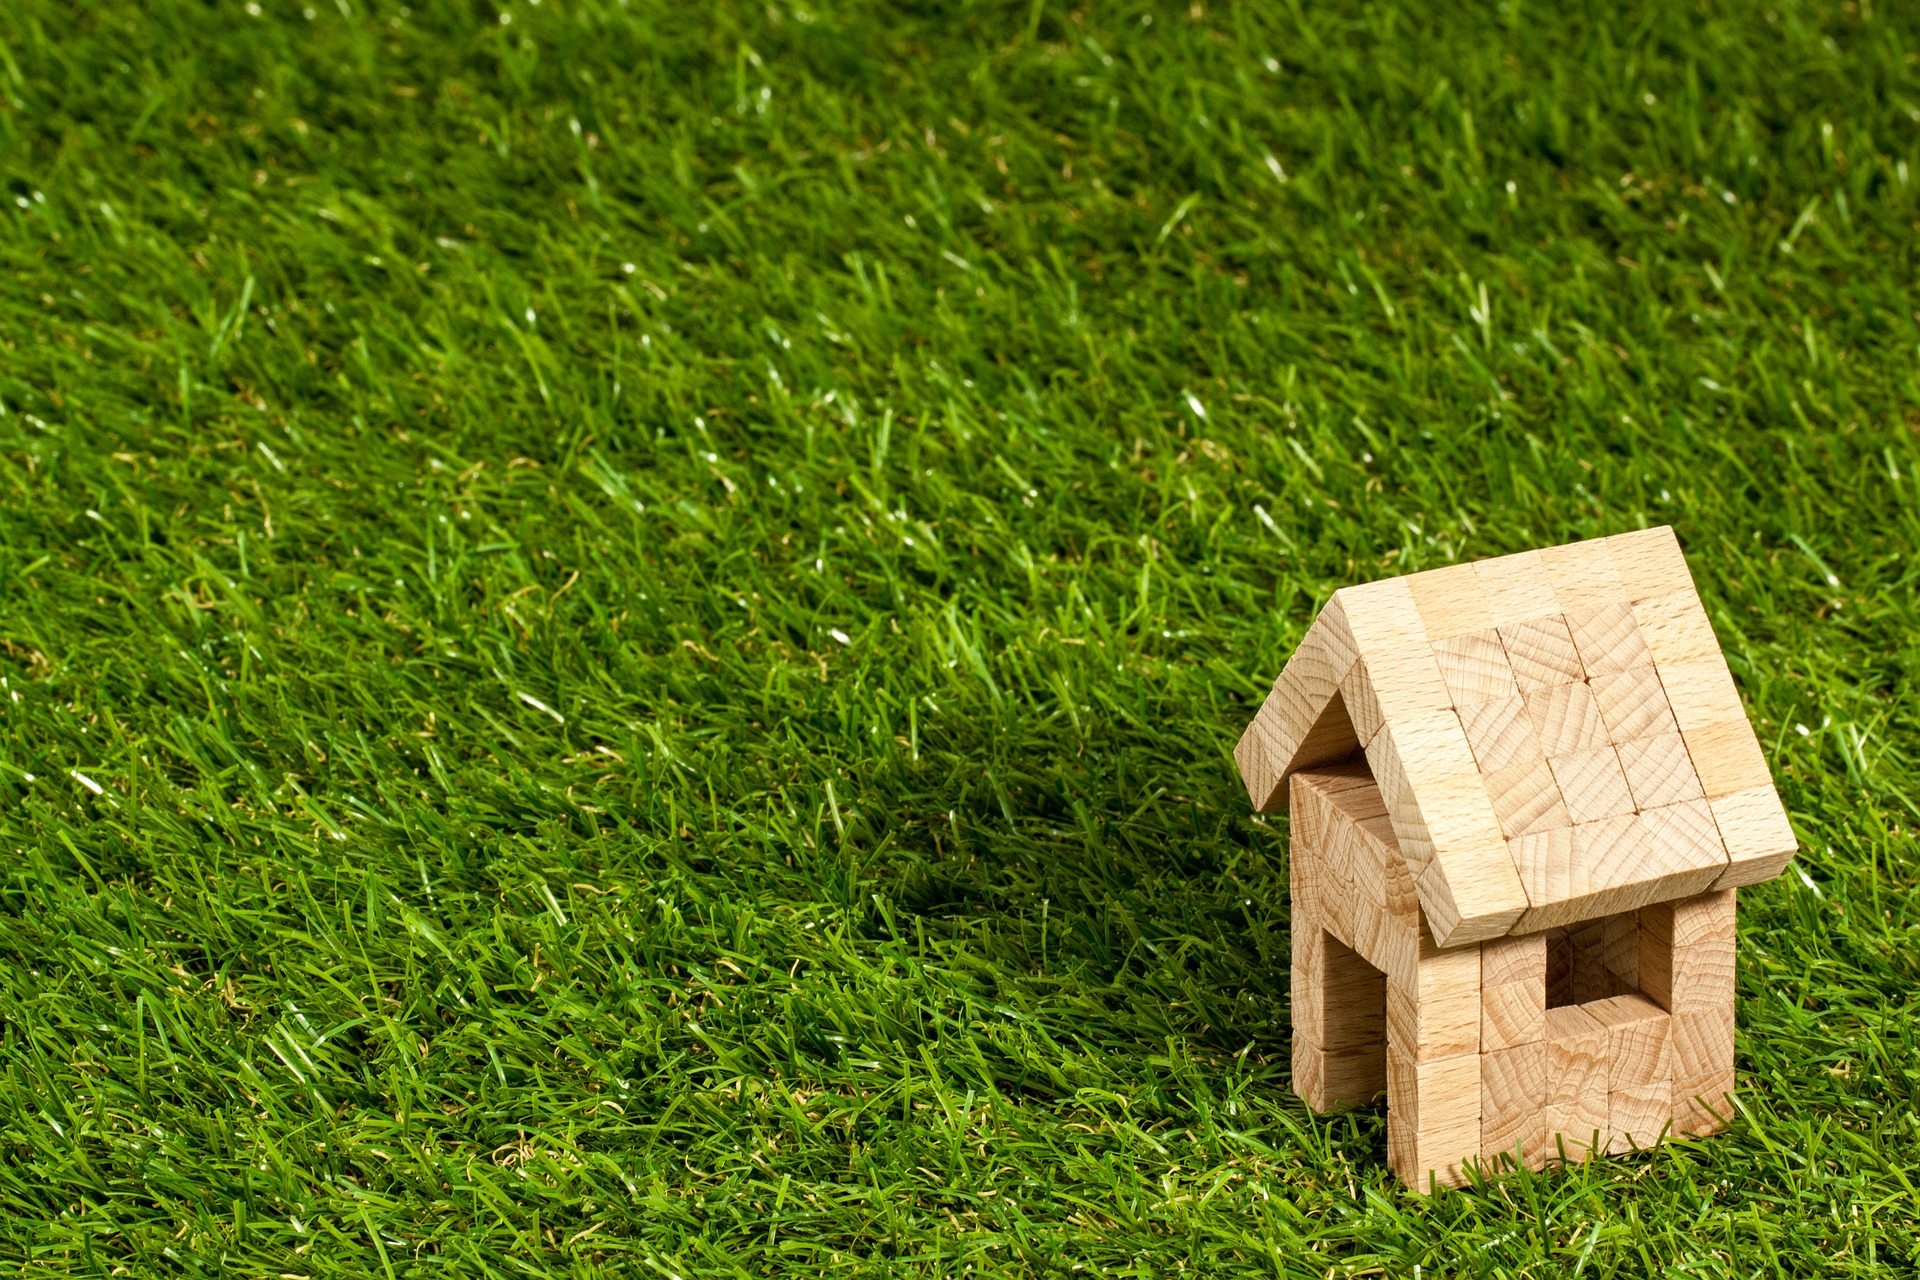 little wooden house in grass